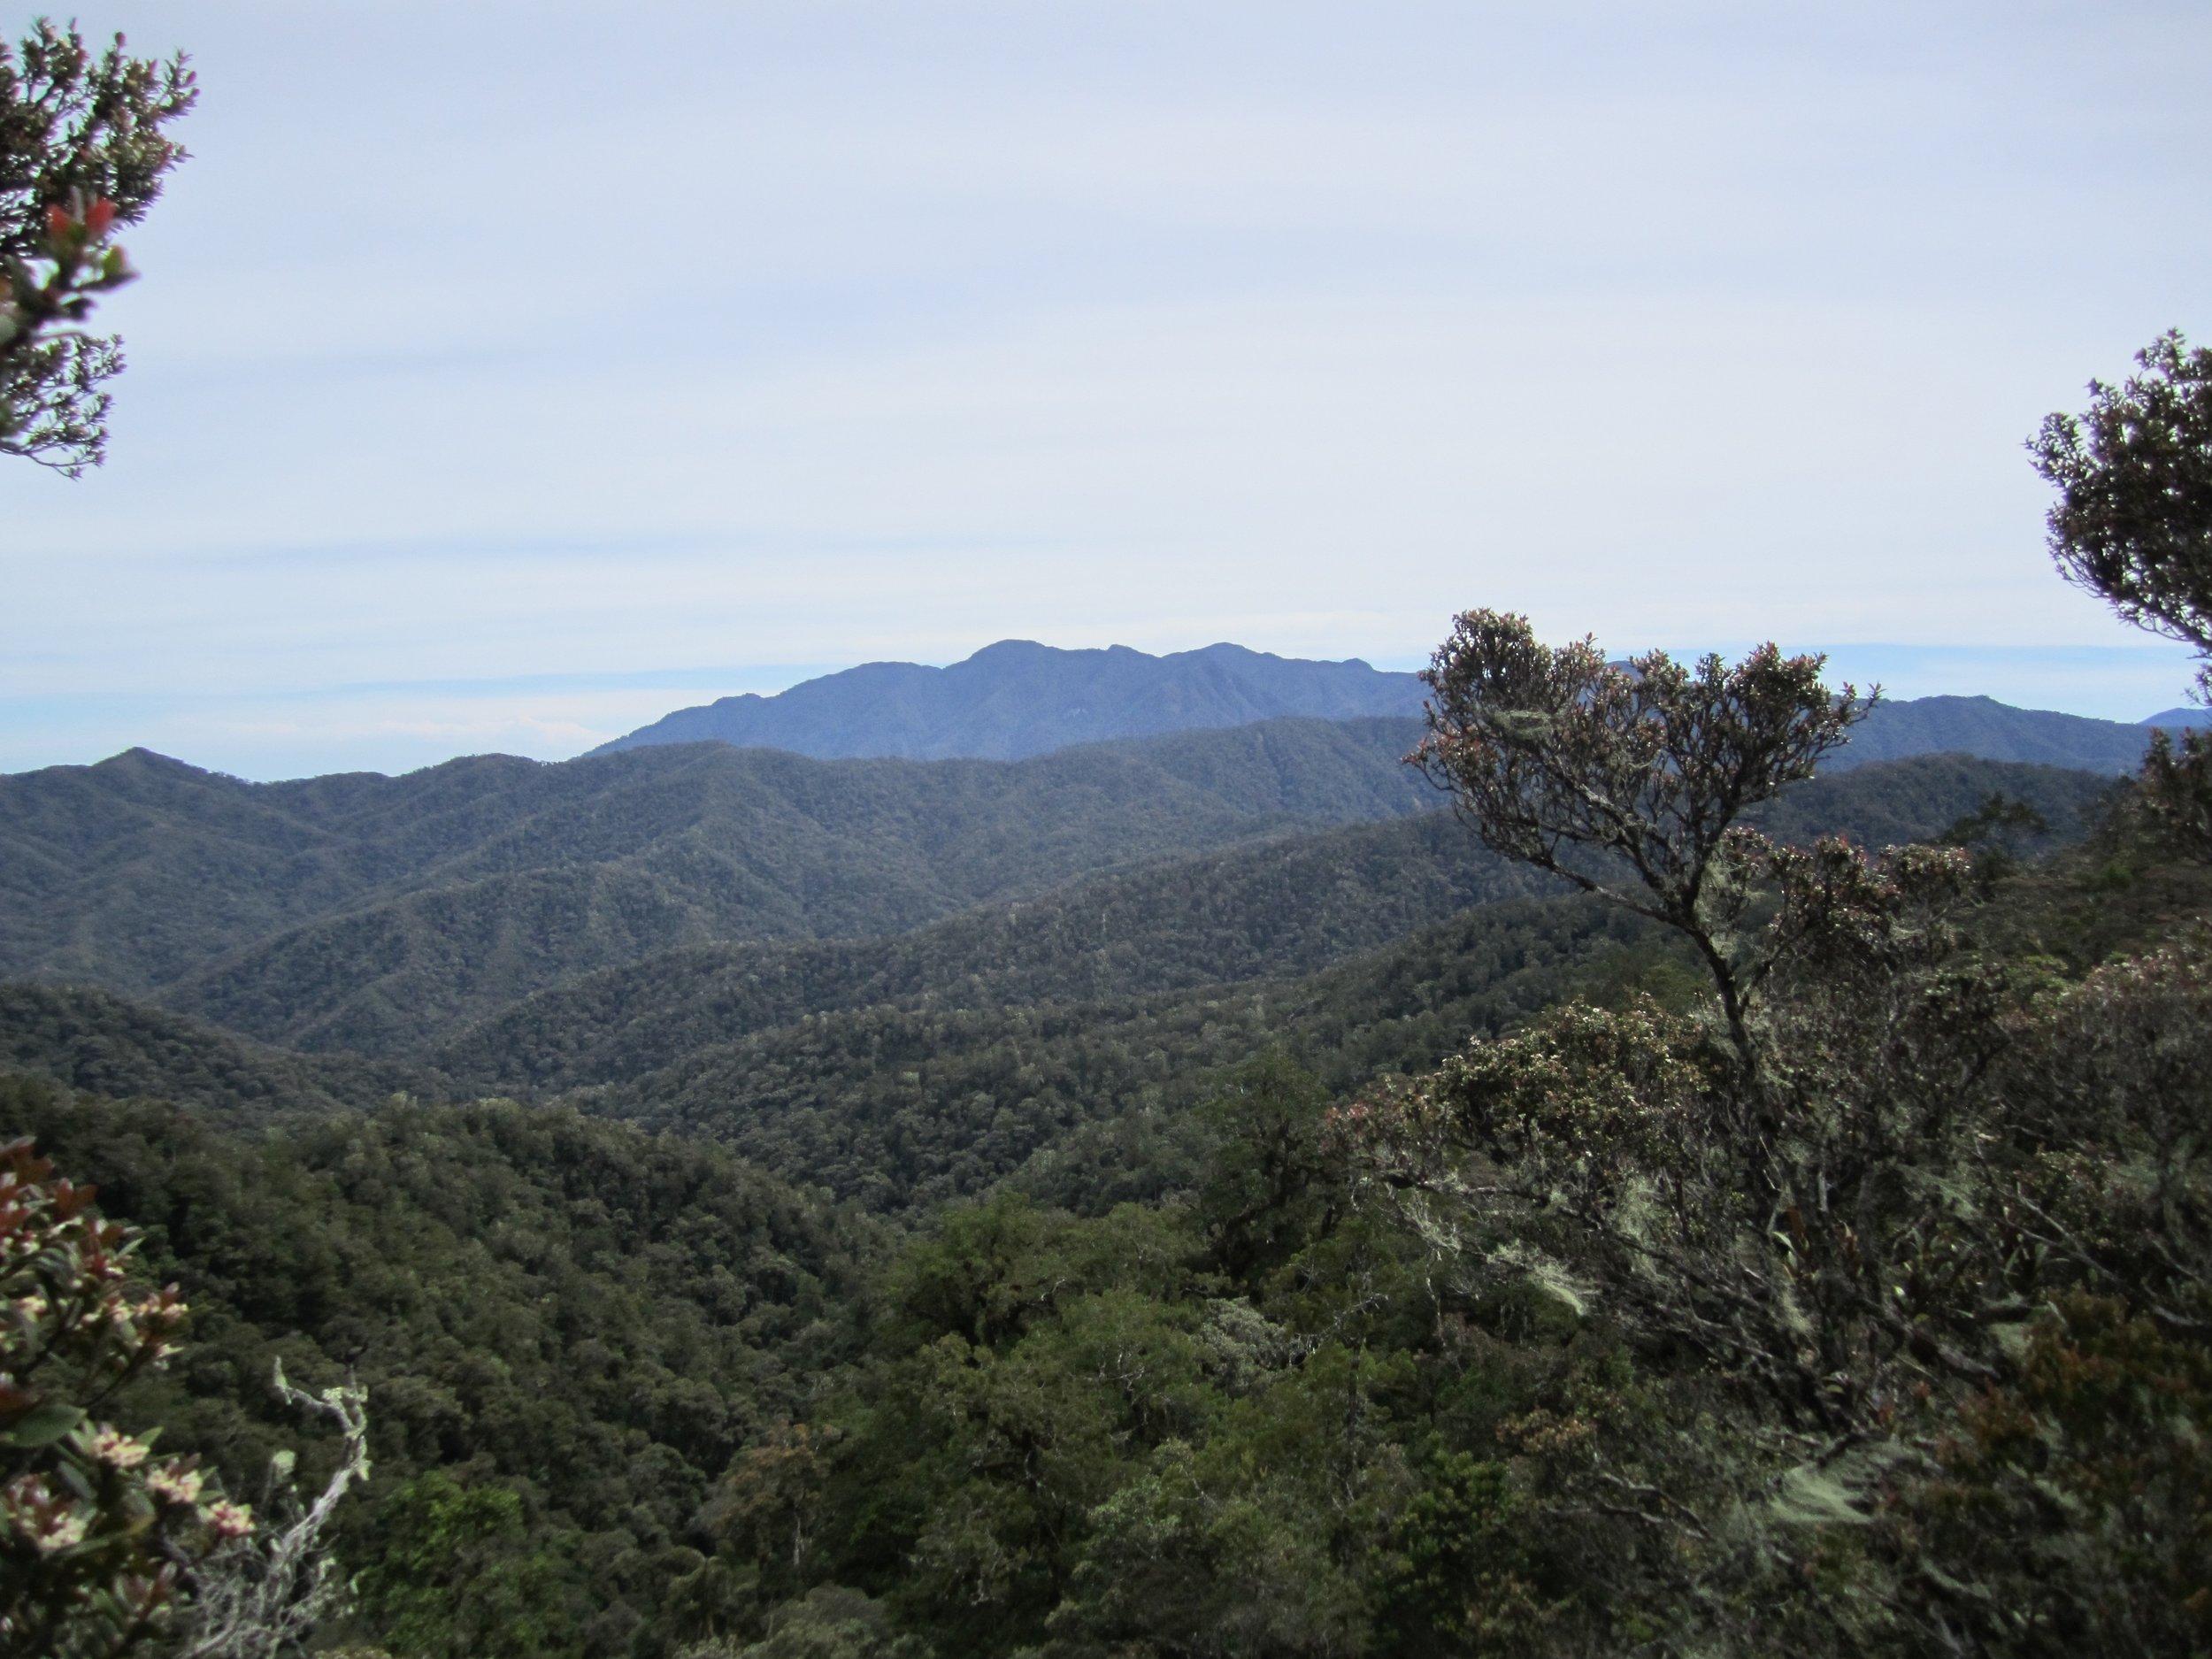 Mt. Gandangdewata